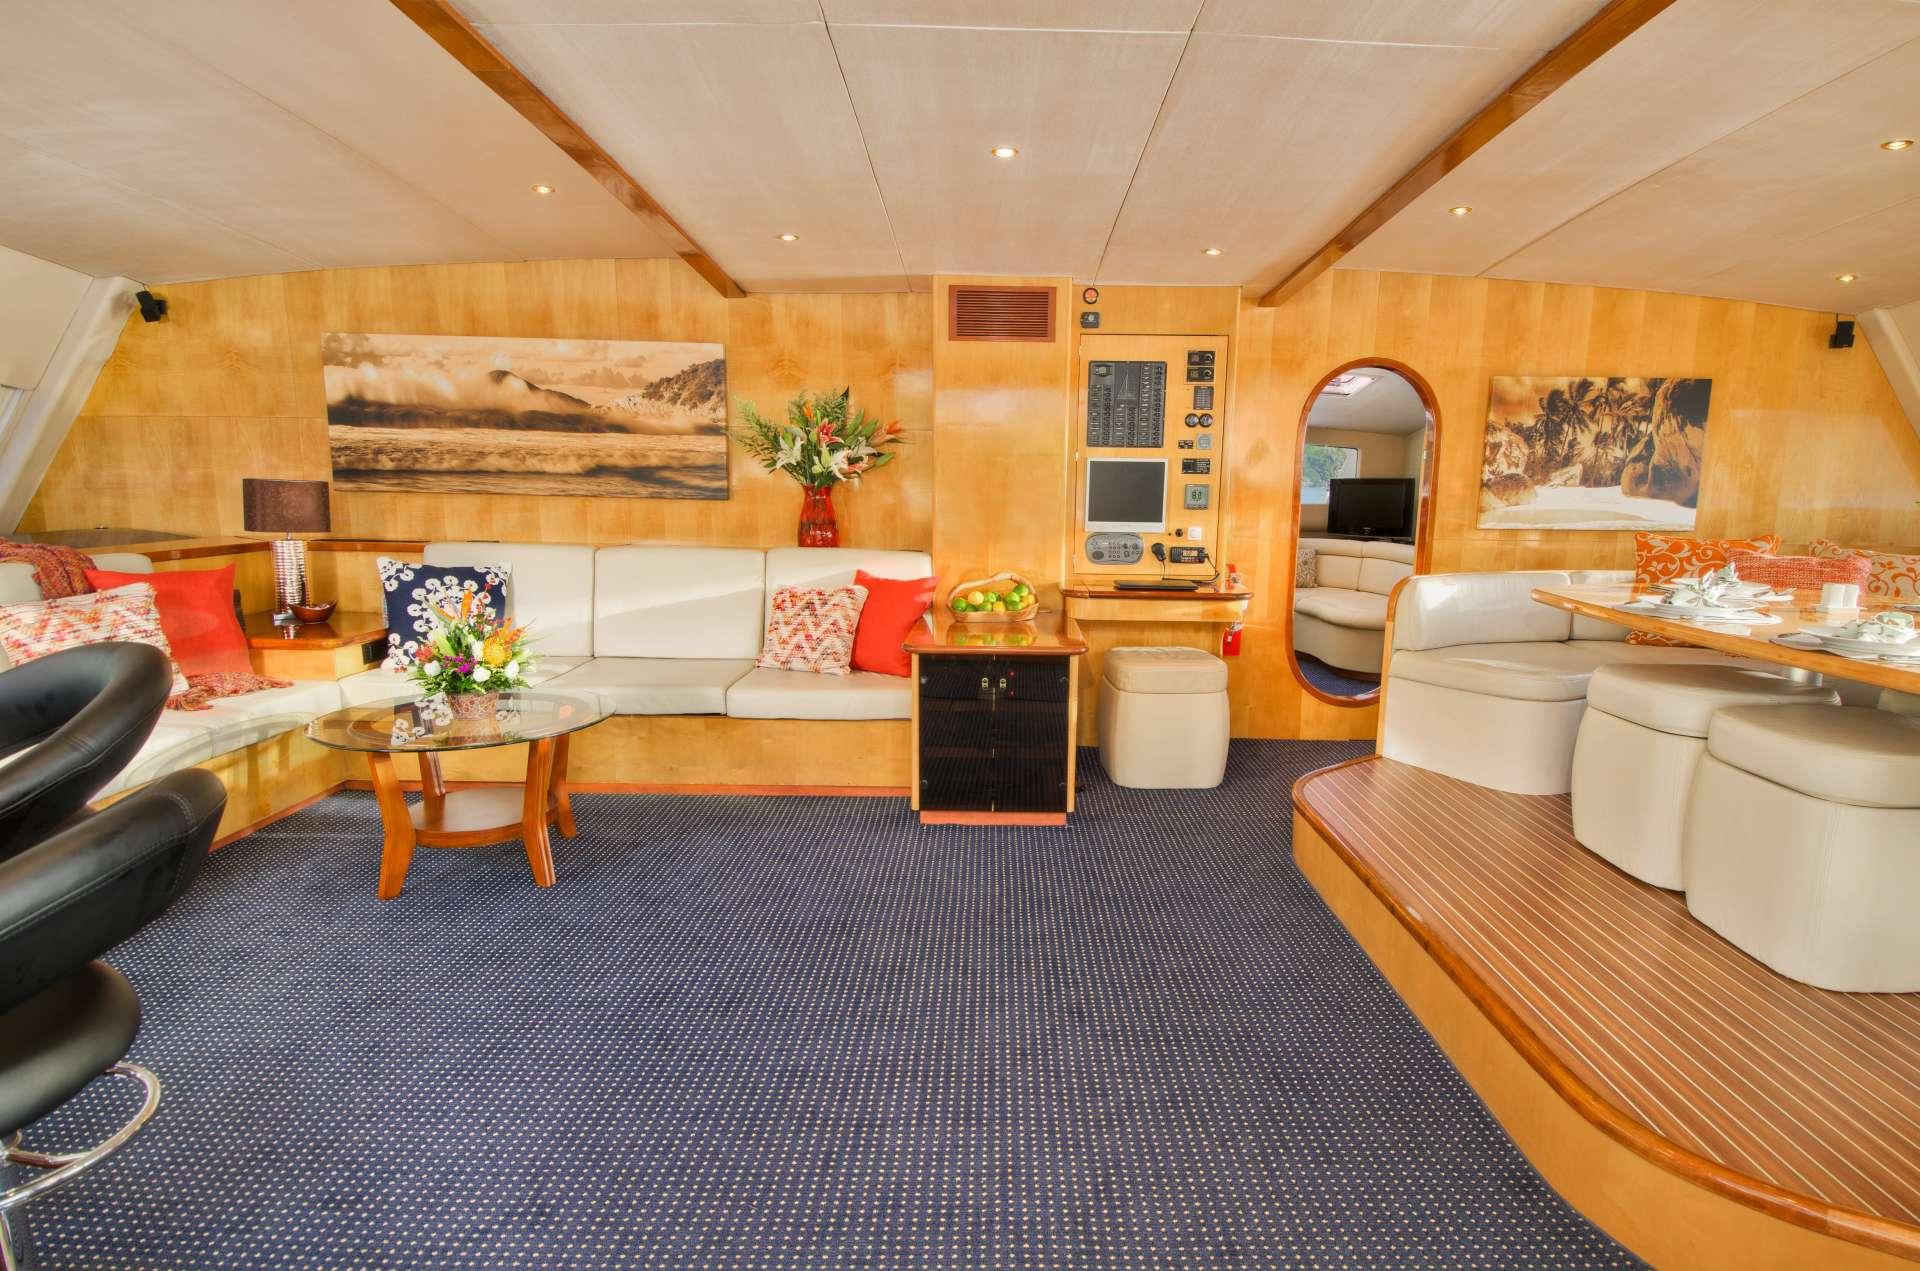 Catamaran Yacht 'ZINGARA', 10 PAX, 4 Crew, 76.00 Ft, 23.00 Meters, Built 2006, Silhouette, Refit Year 2017